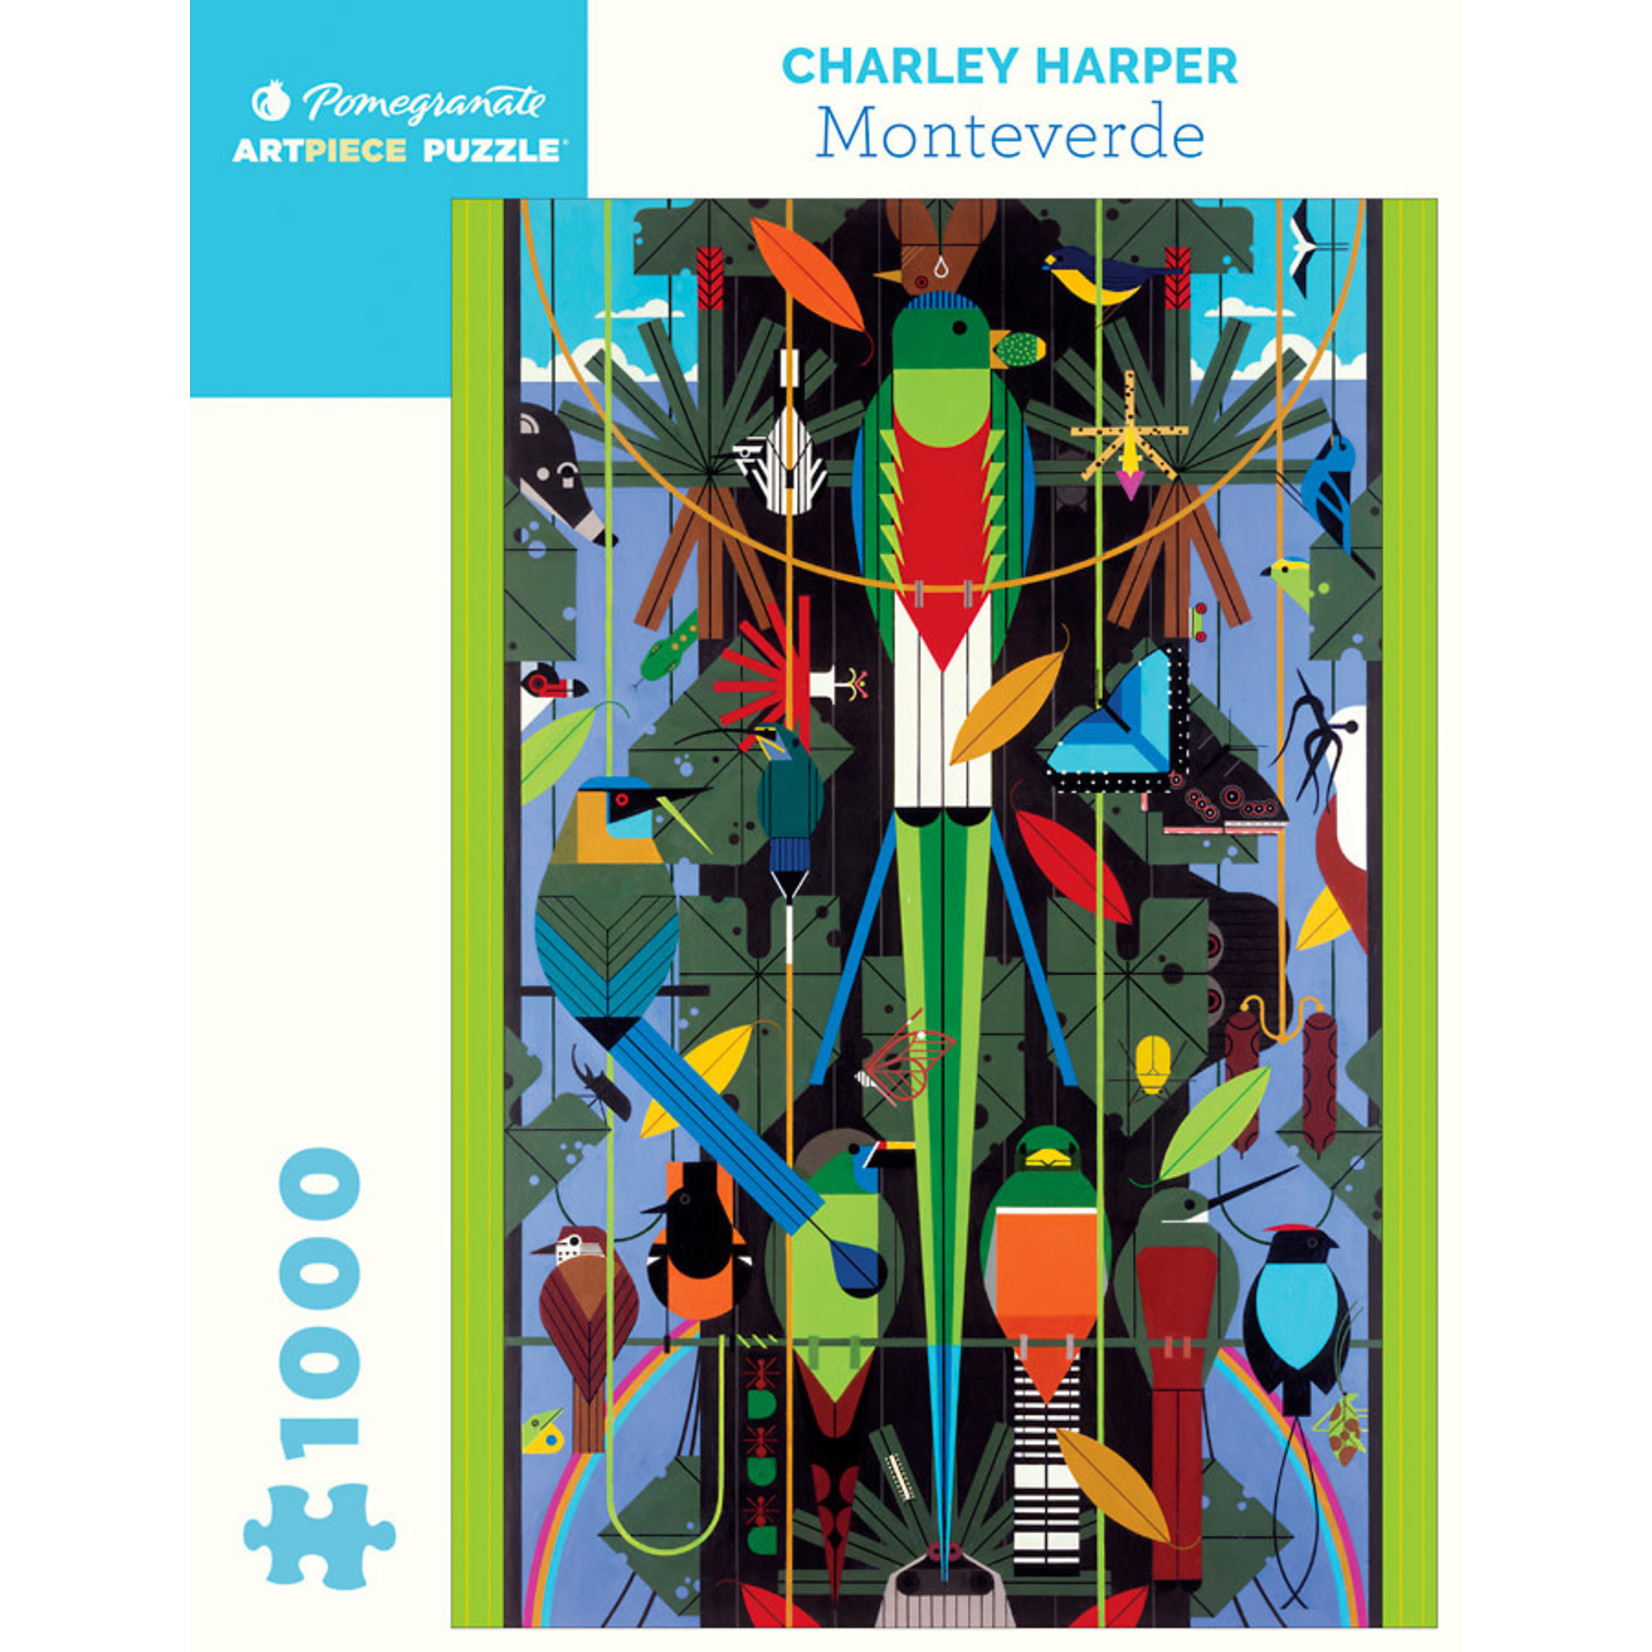 Pomegranate Charley Harper - Monteverde - 1000 Piece Jigsaw Puzzle